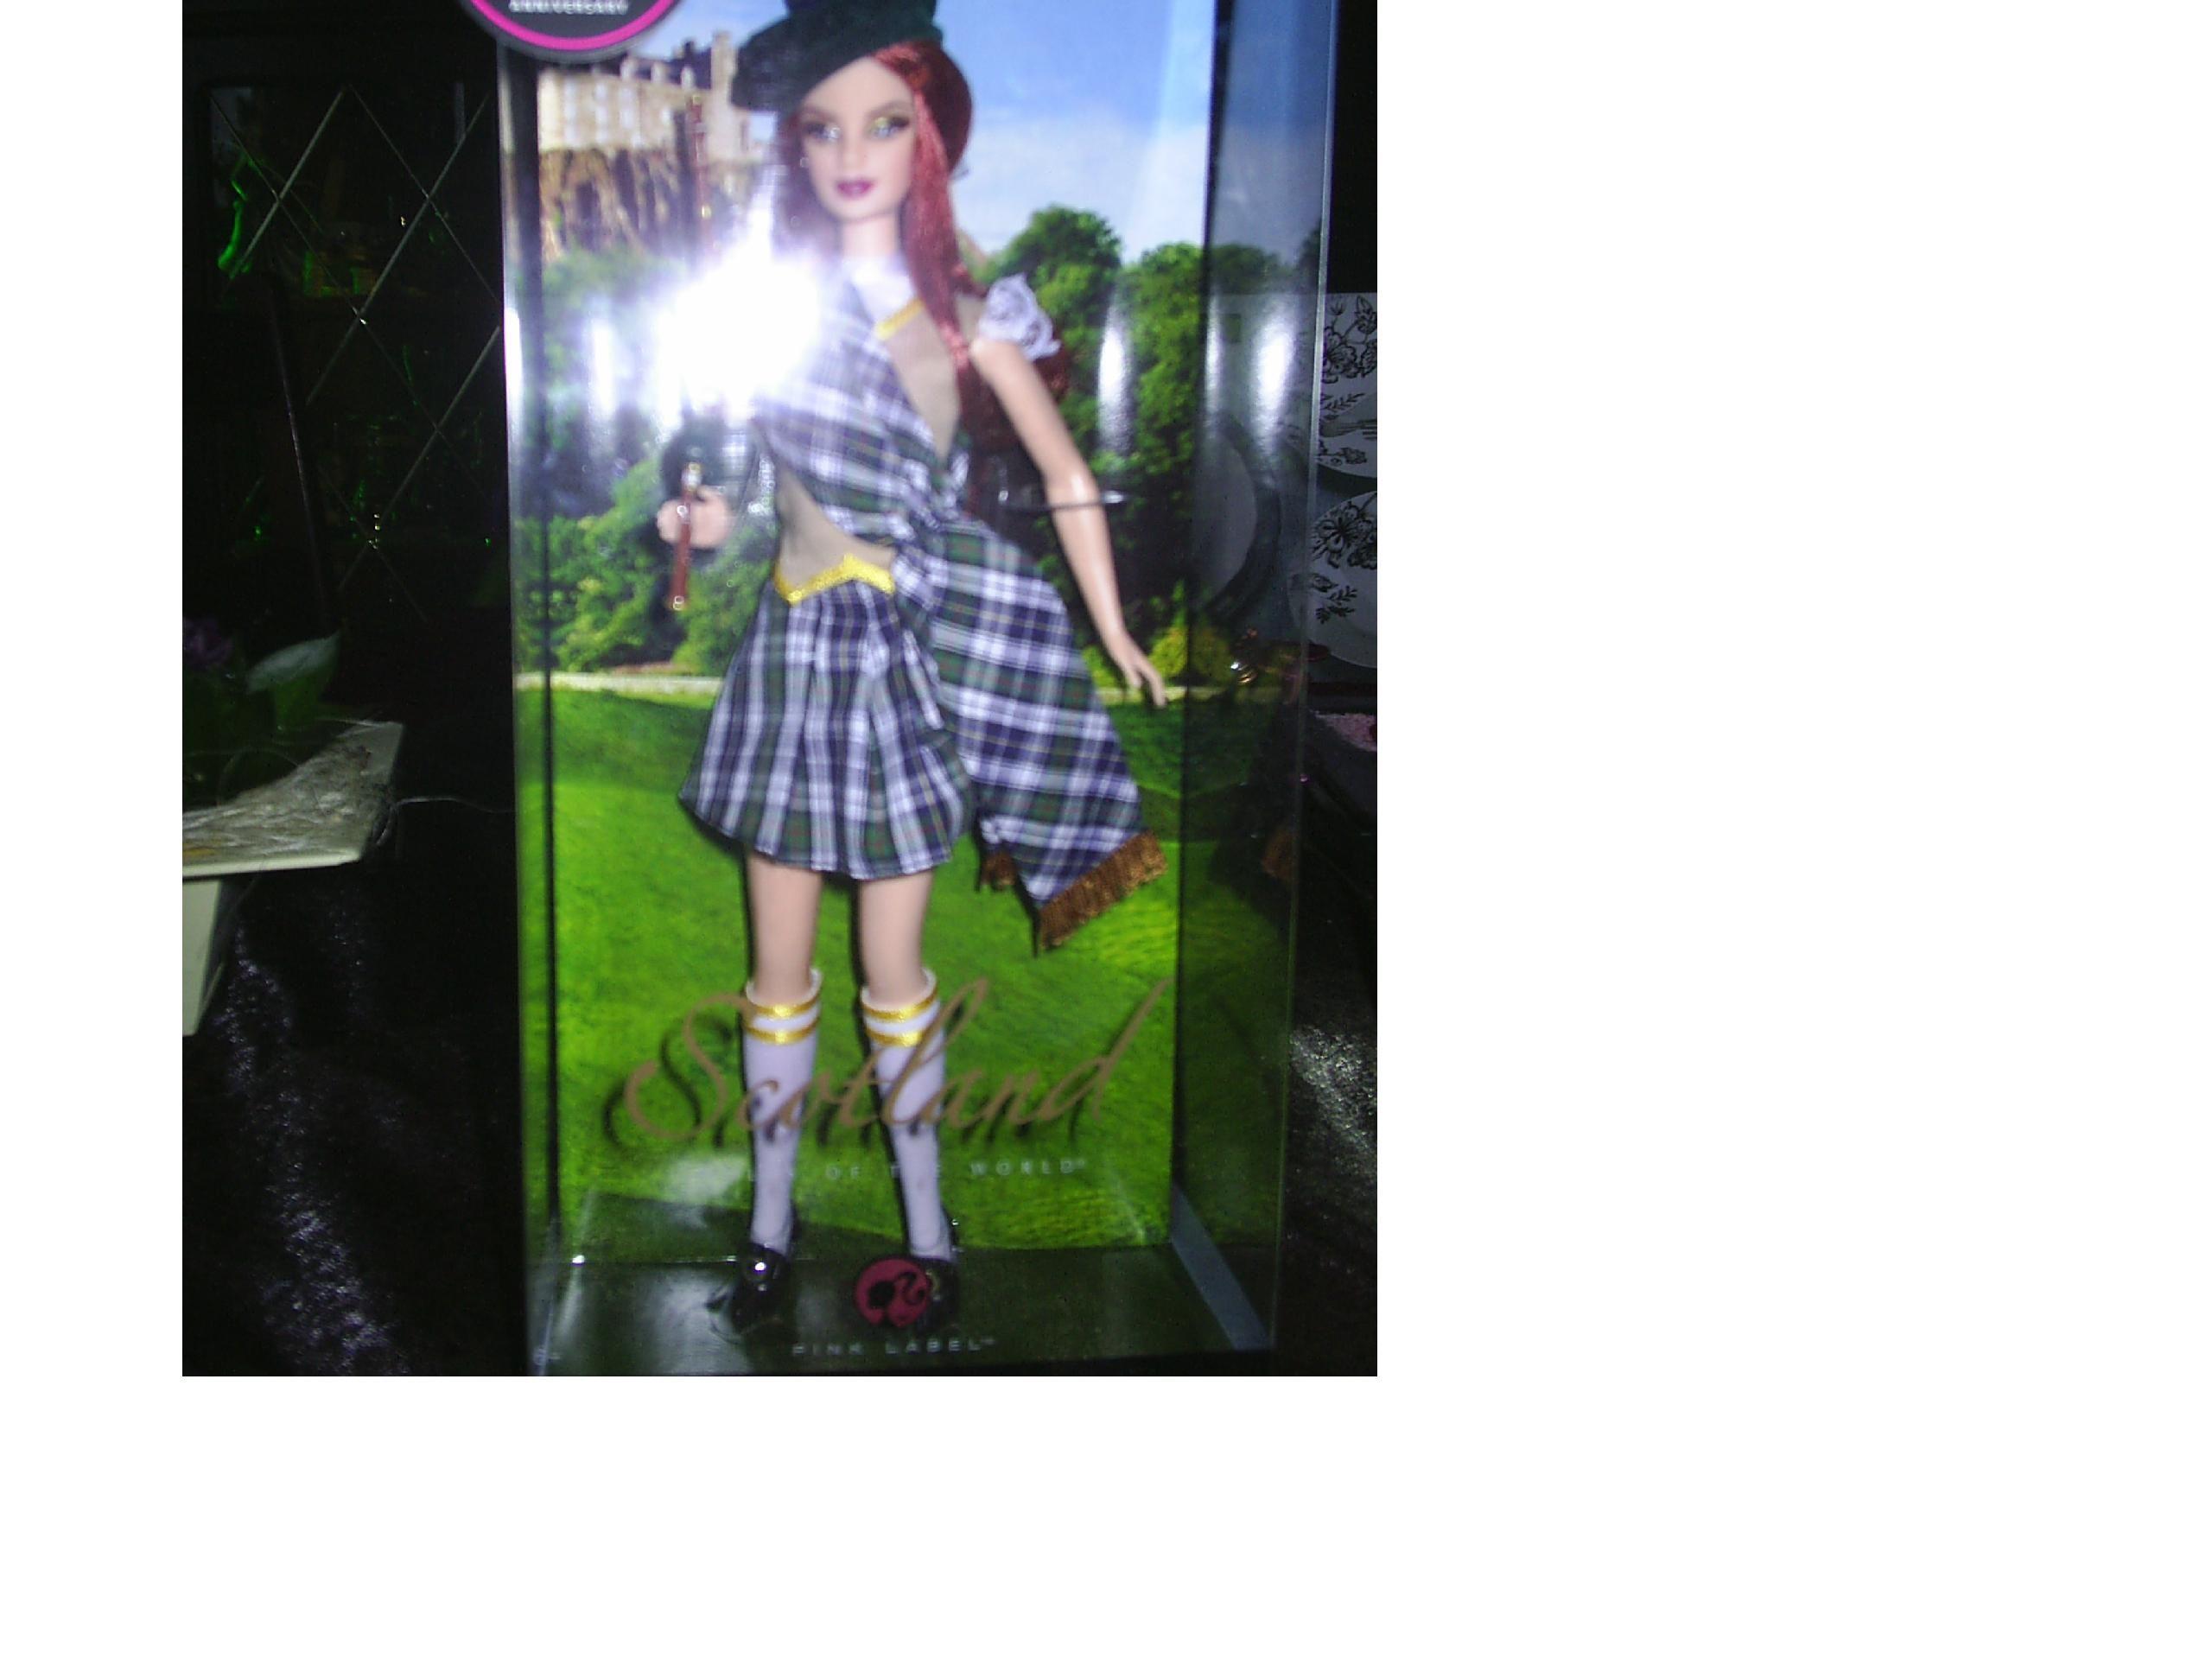 Salle De Bain Vintage Barbie – Furtrades.com